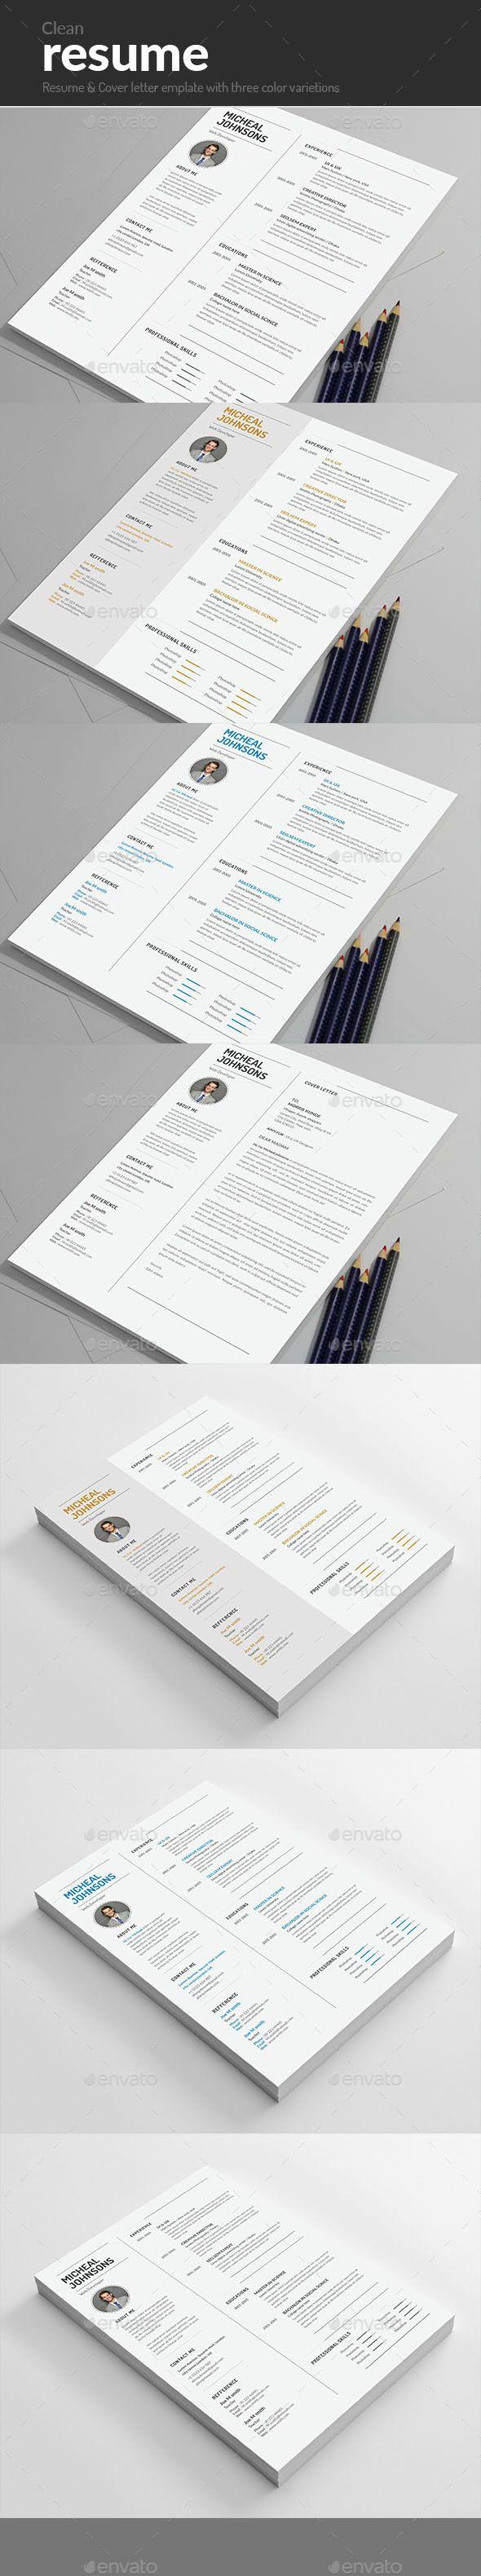 277 best resume images on pinterest resume templates font logo